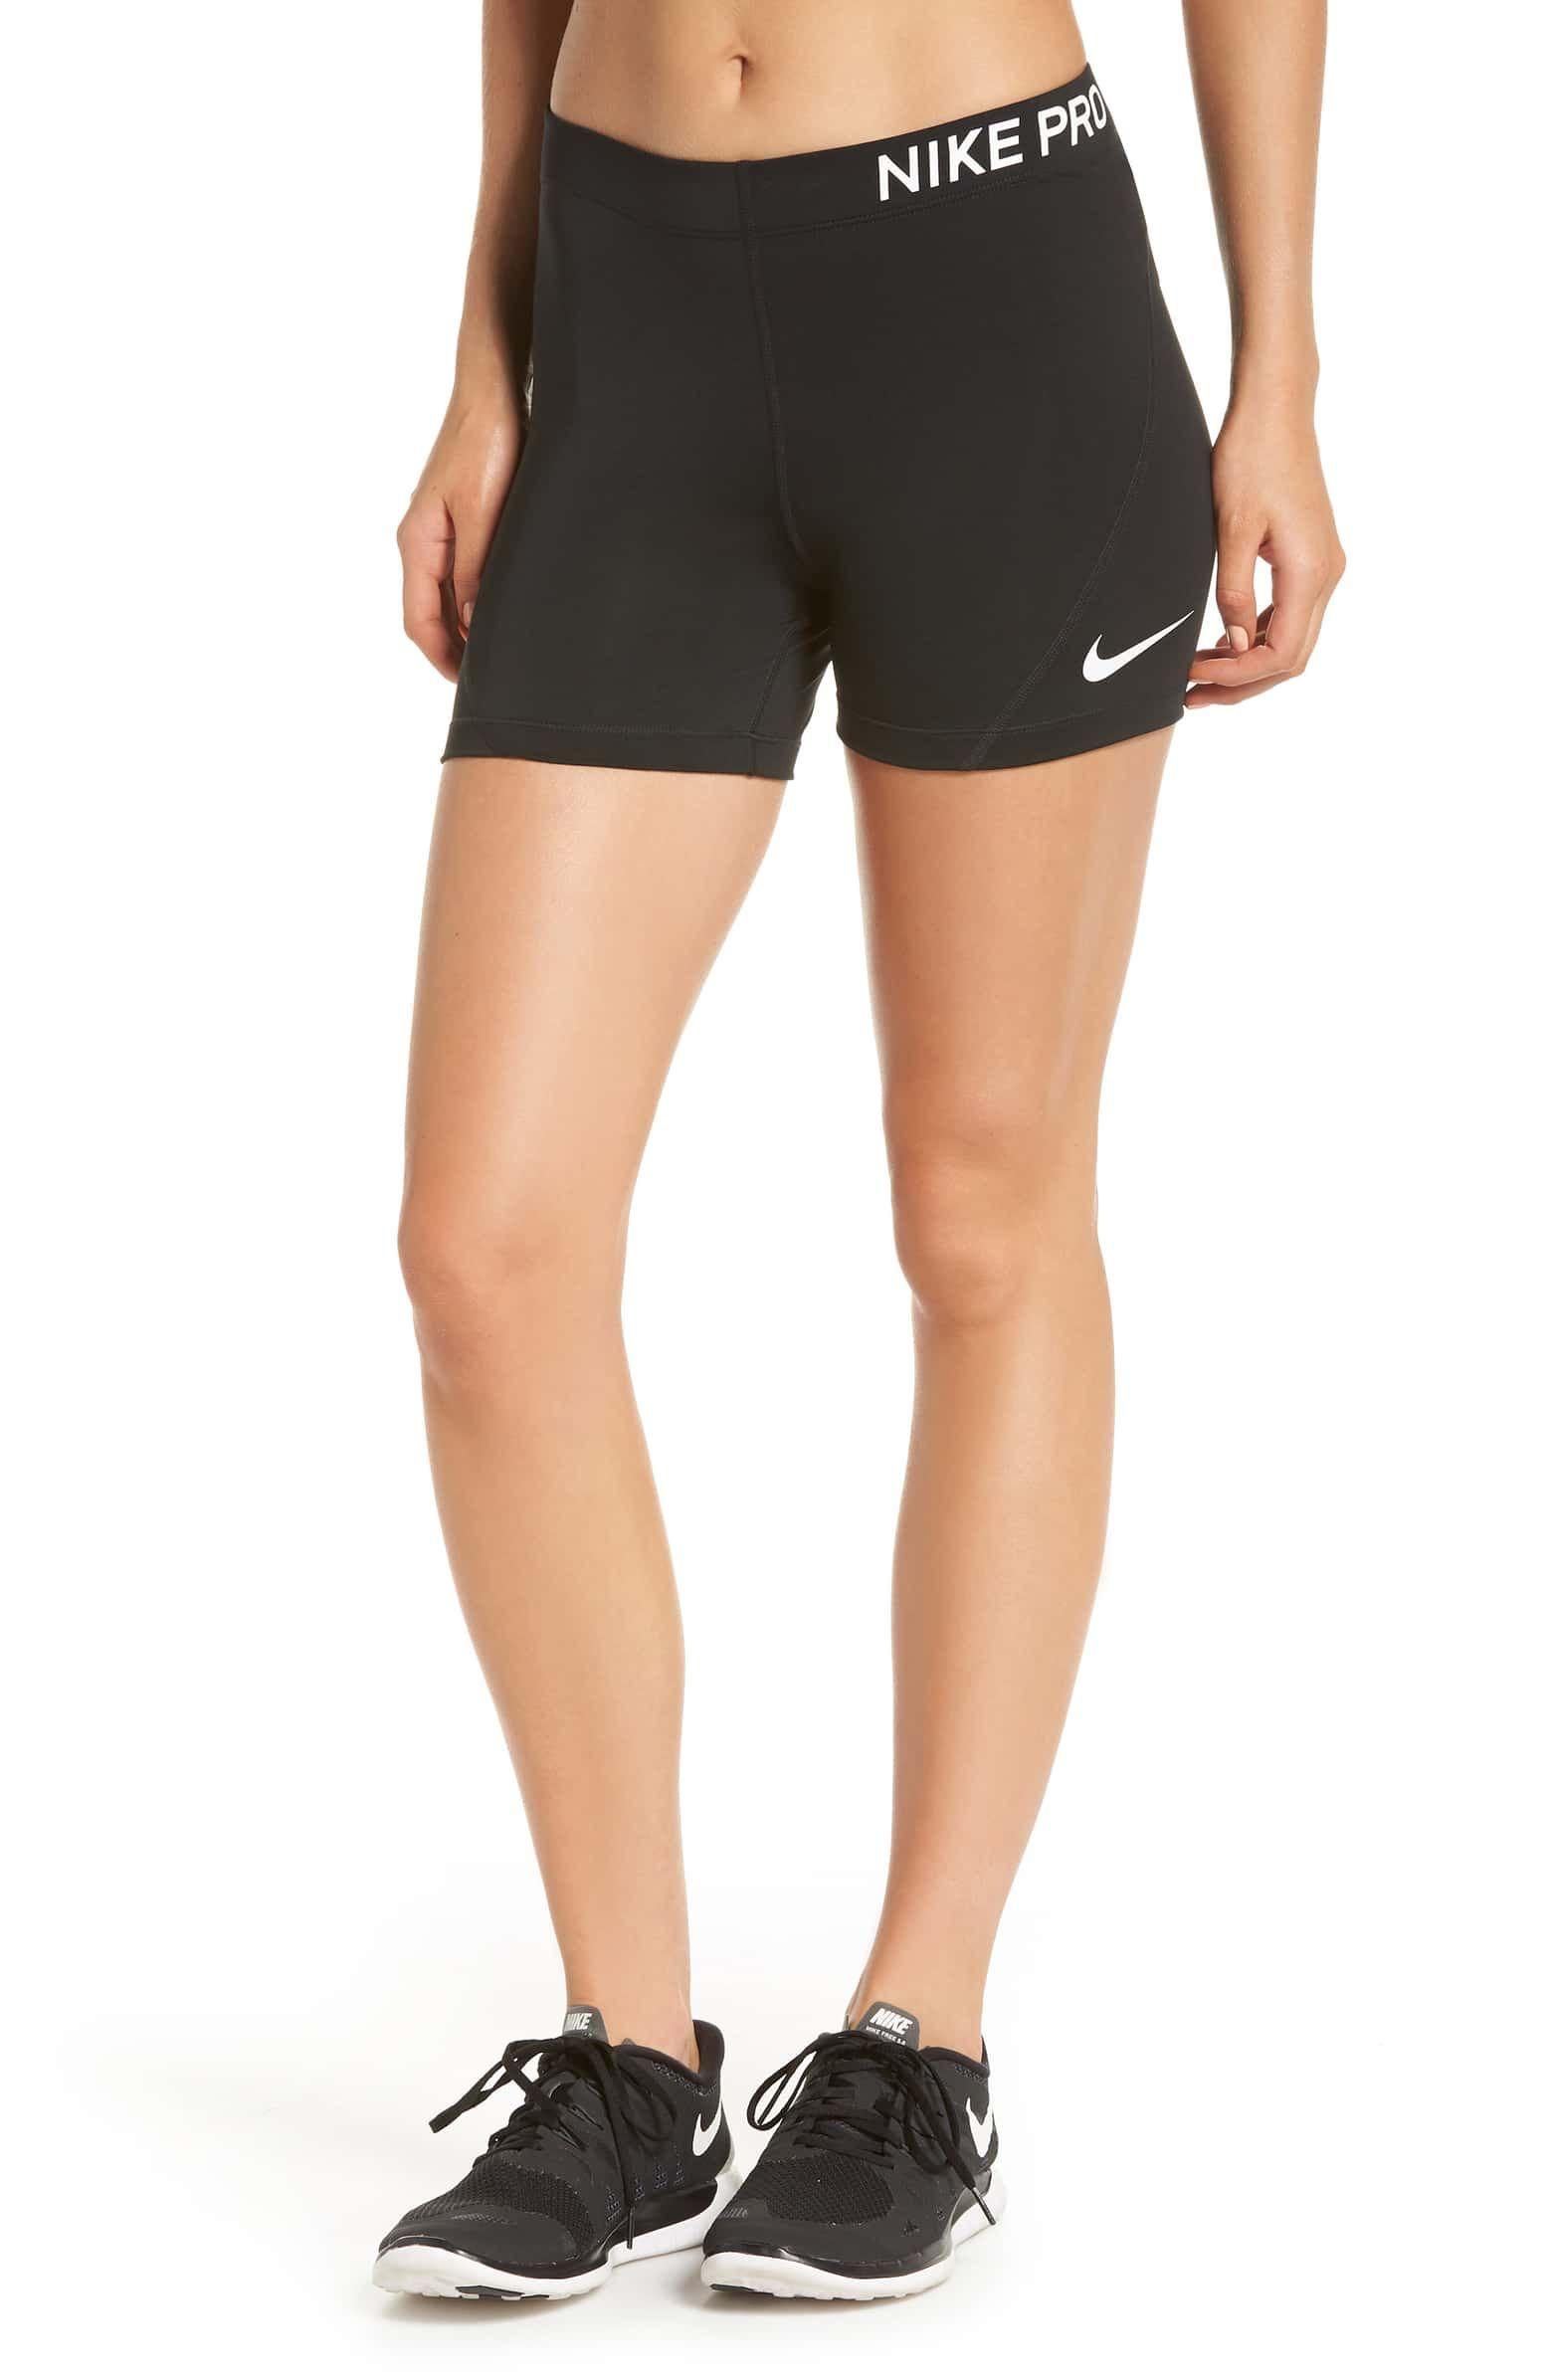 Pro Training Shorts Active wear for women, Training